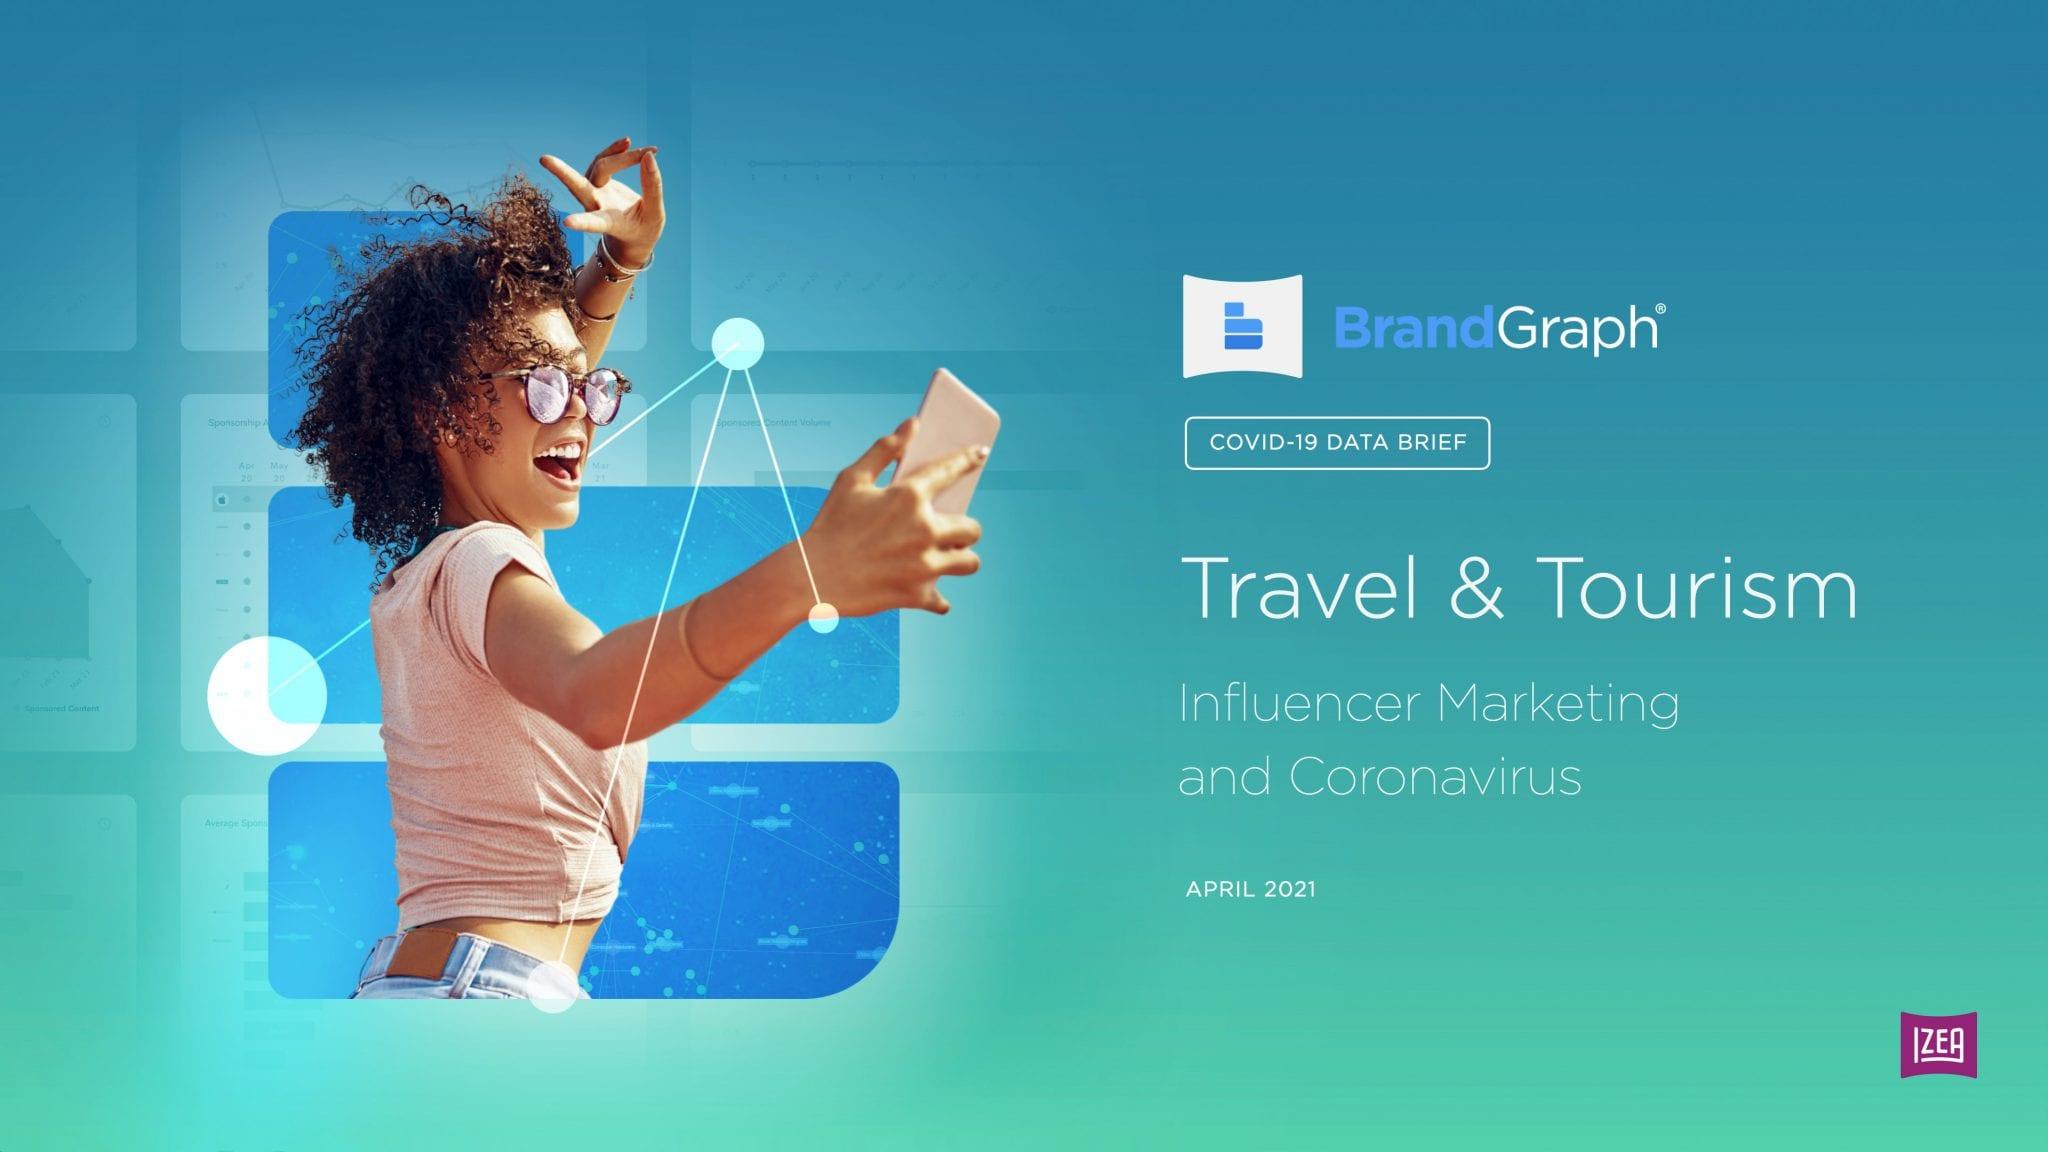 brandgraph travel and tourism pdf cover